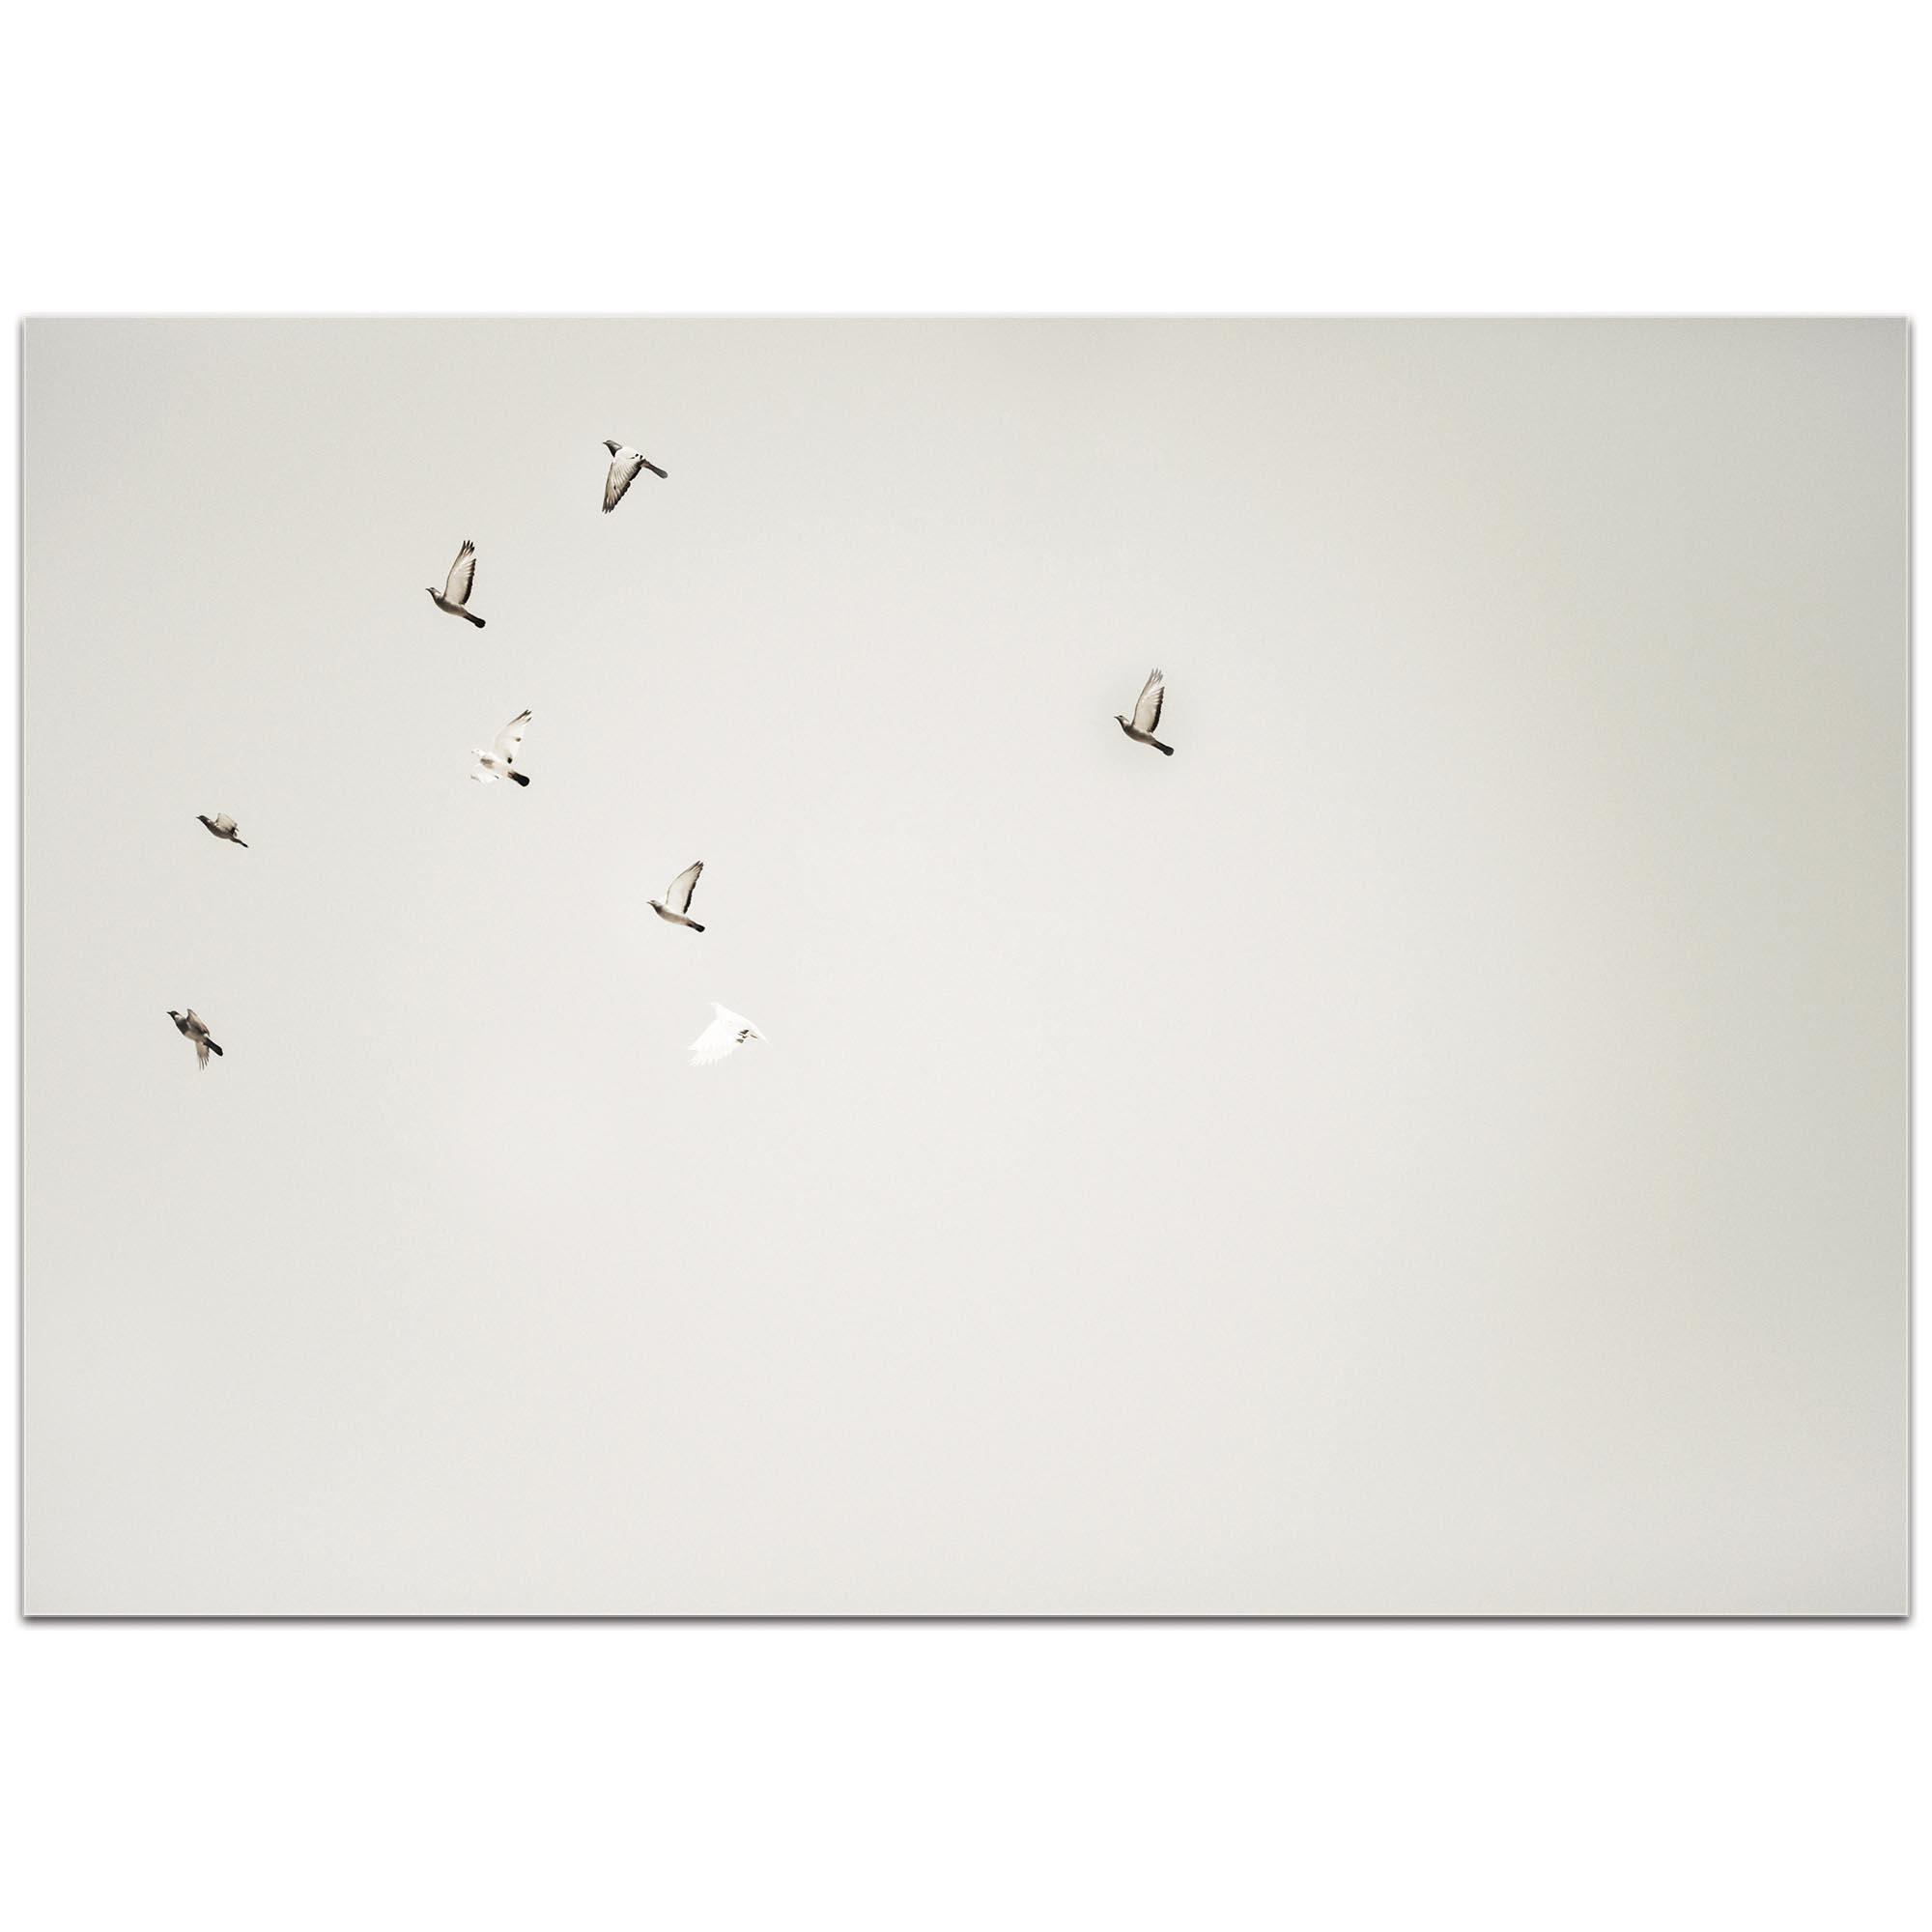 Minimalist Wall Art 'The Journey' - Wildlife Decor on Metal or Plexiglass - Image 2